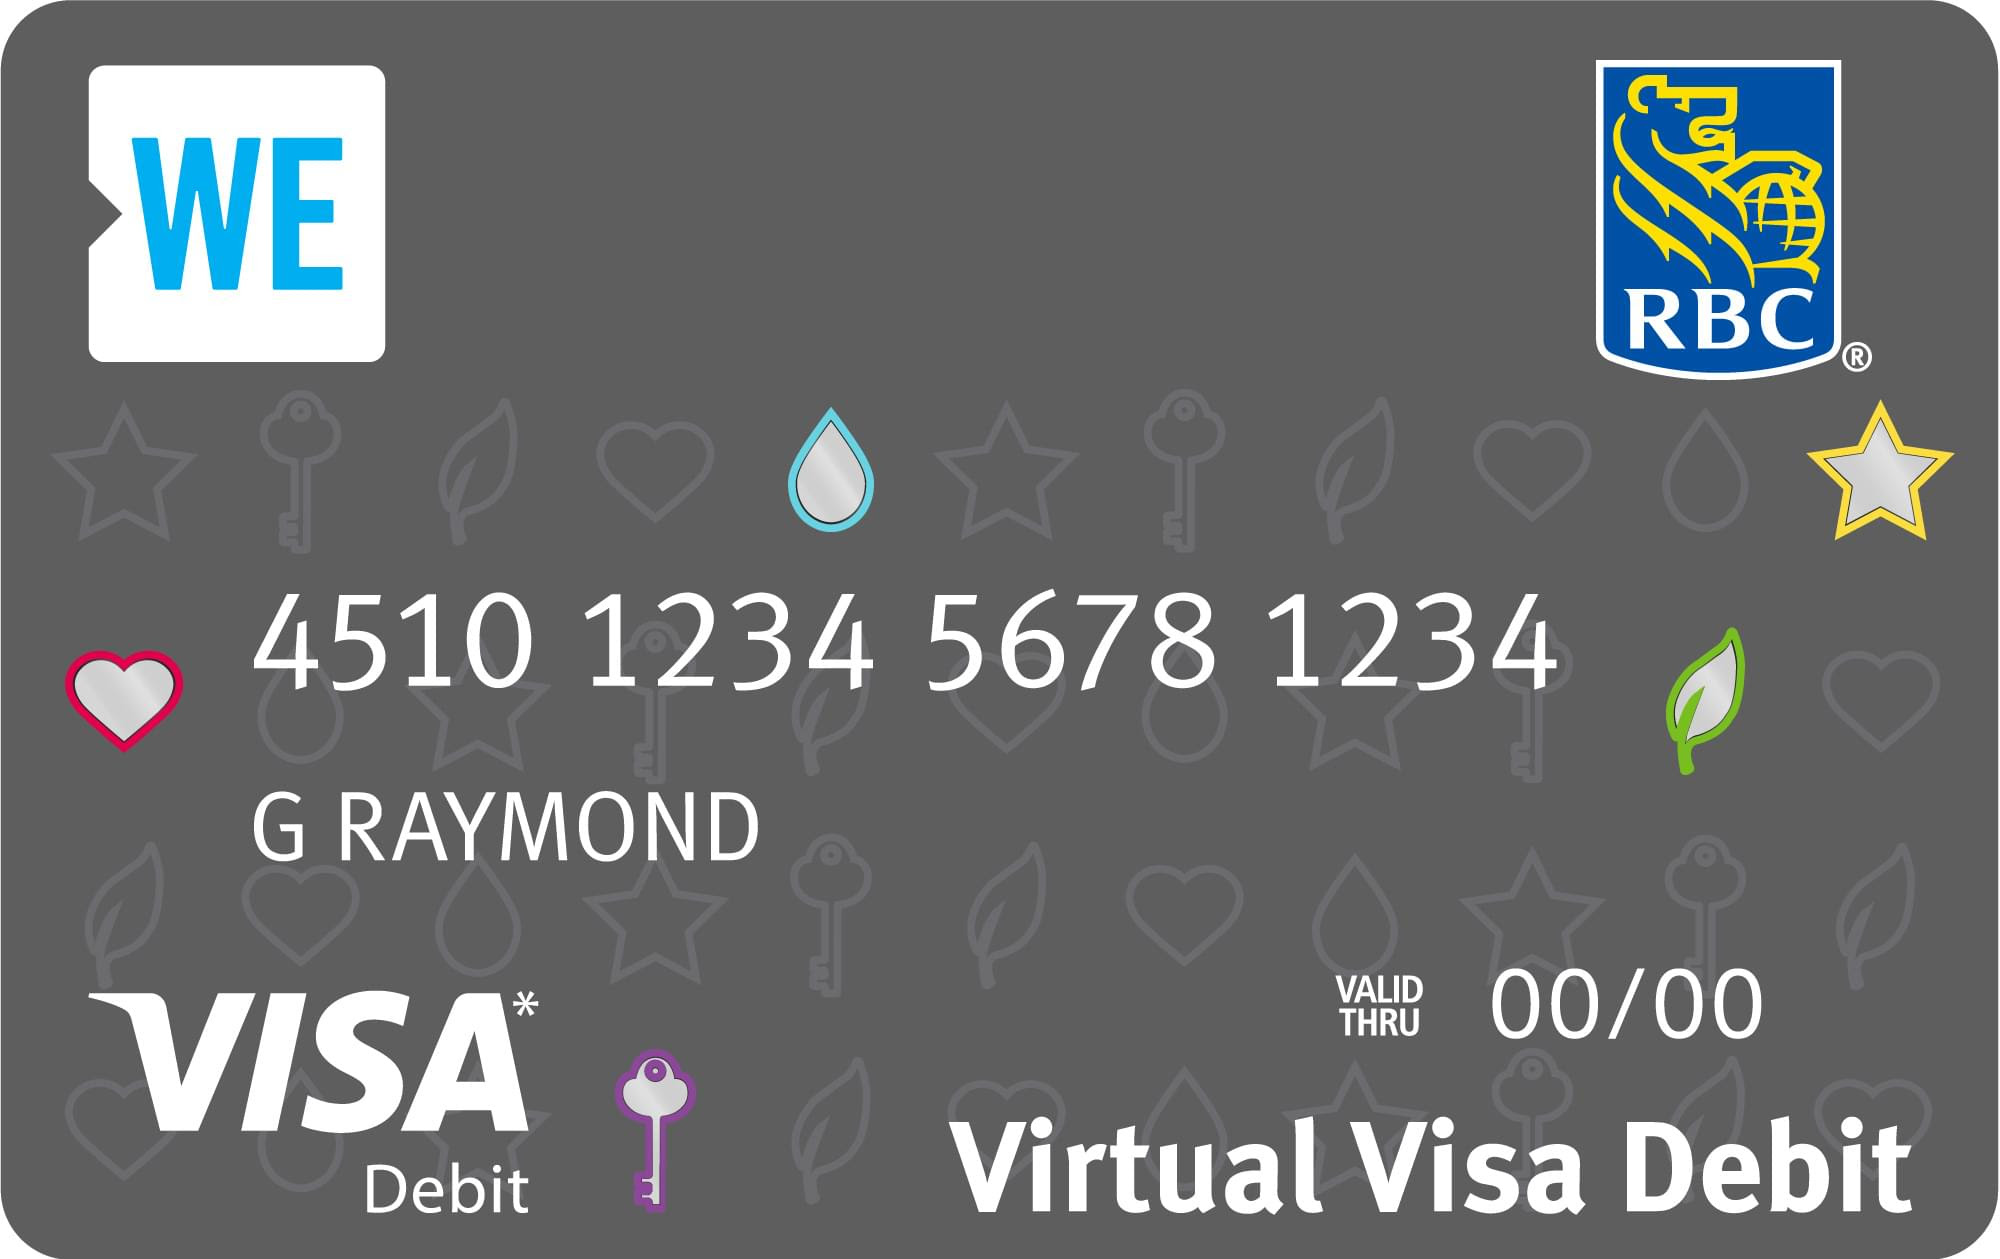 WE RBC Virtual Visa Debit - RBC Royal Bank